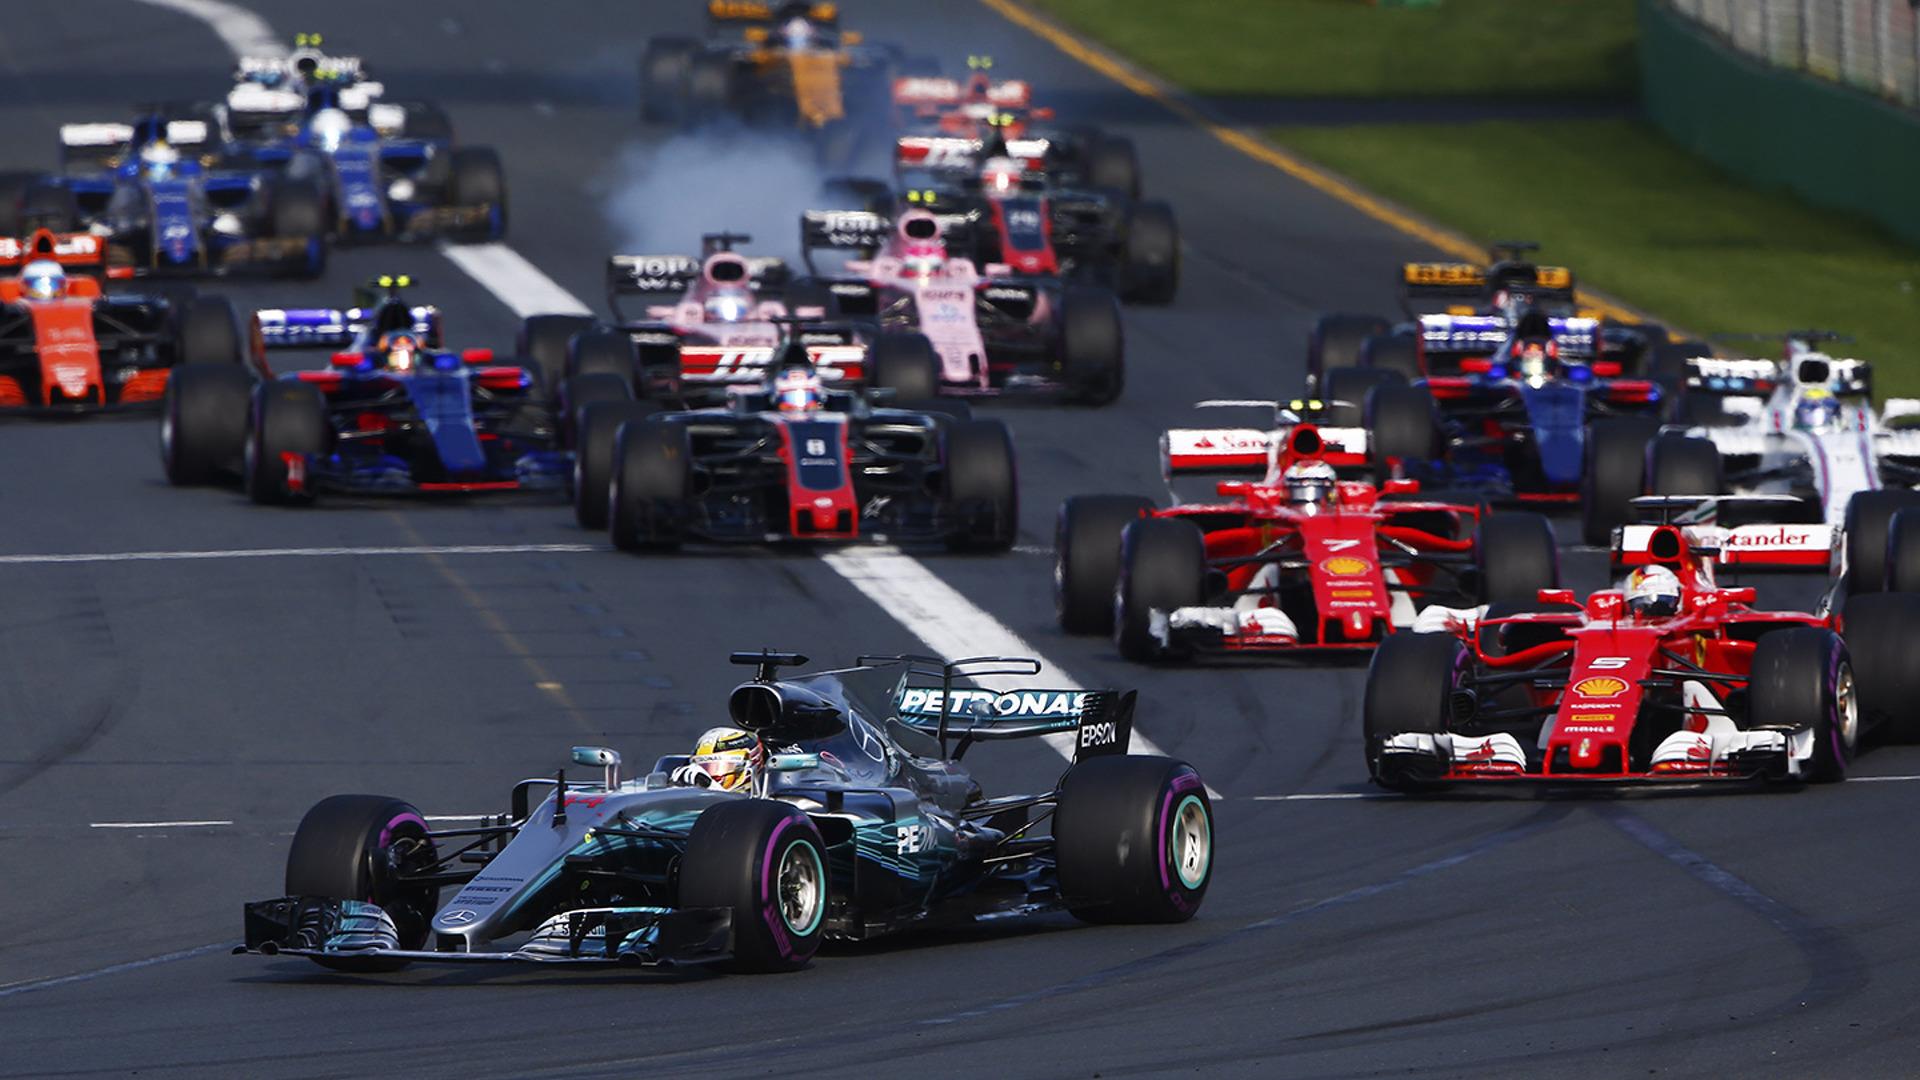 Australian Formula One 1 Grand Prix, Albert Park, Melbourne, Australia. 26 Mar 2017.